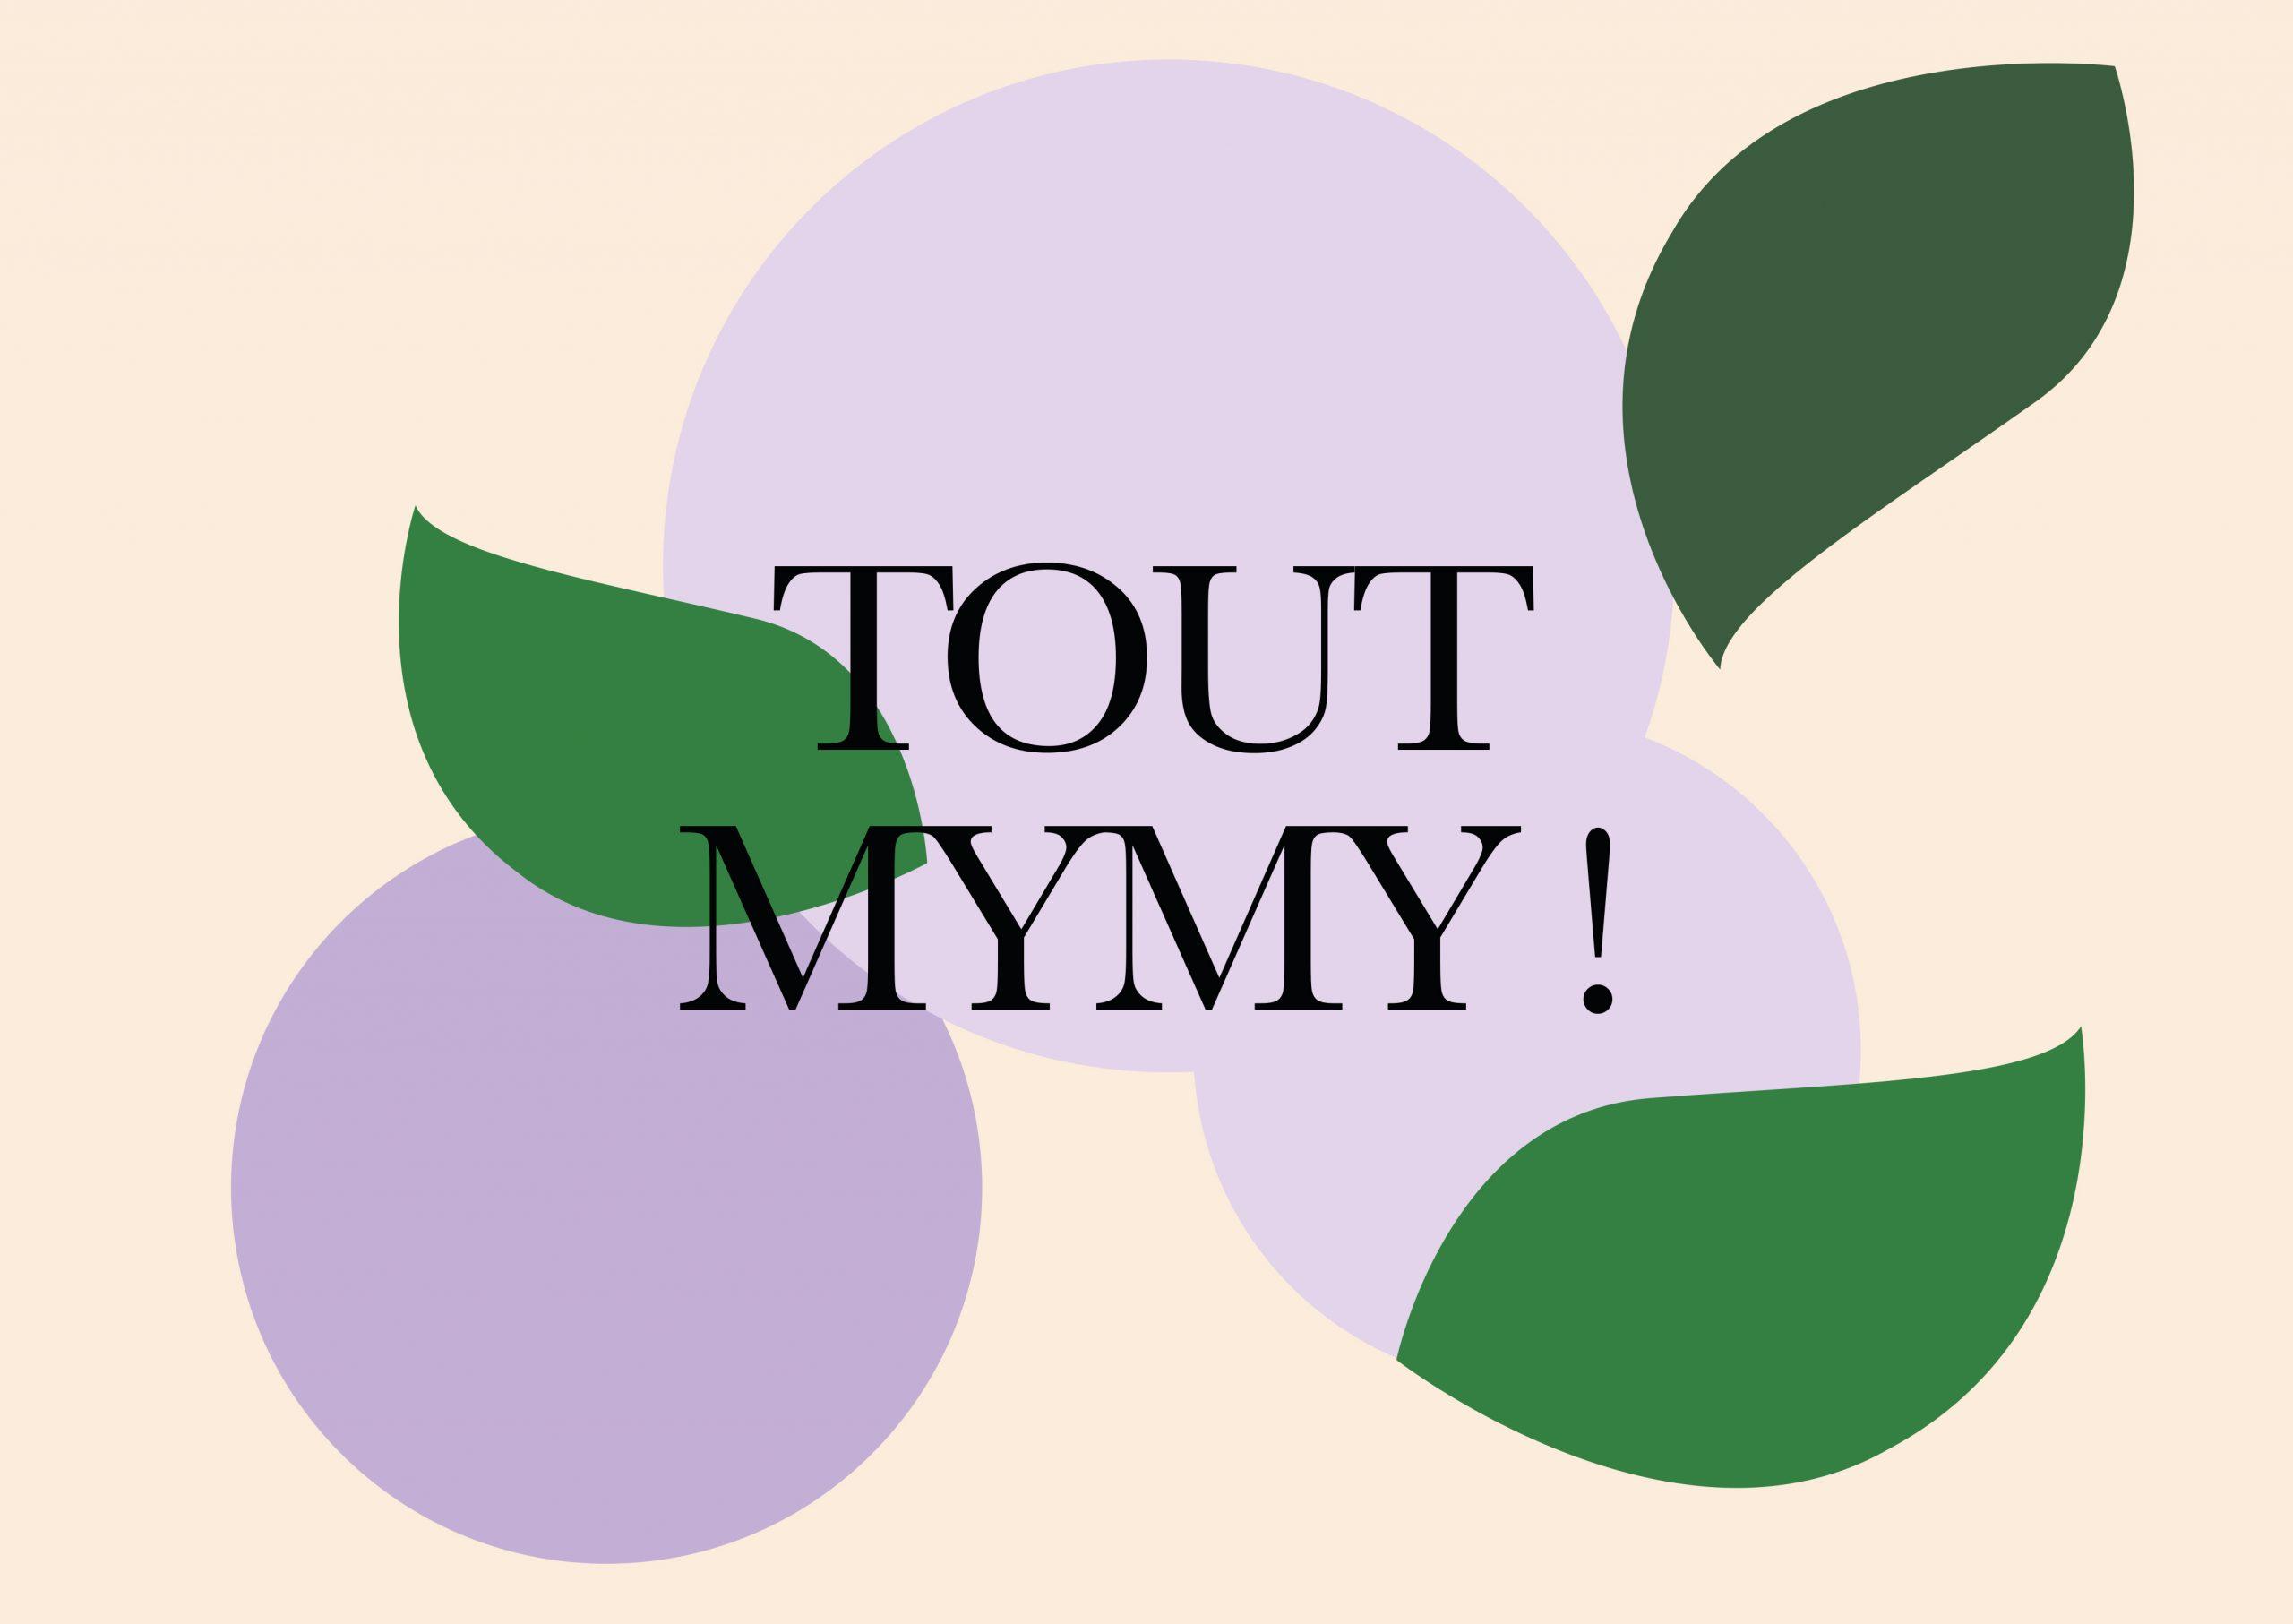 tout mymy logo Jolly Mama